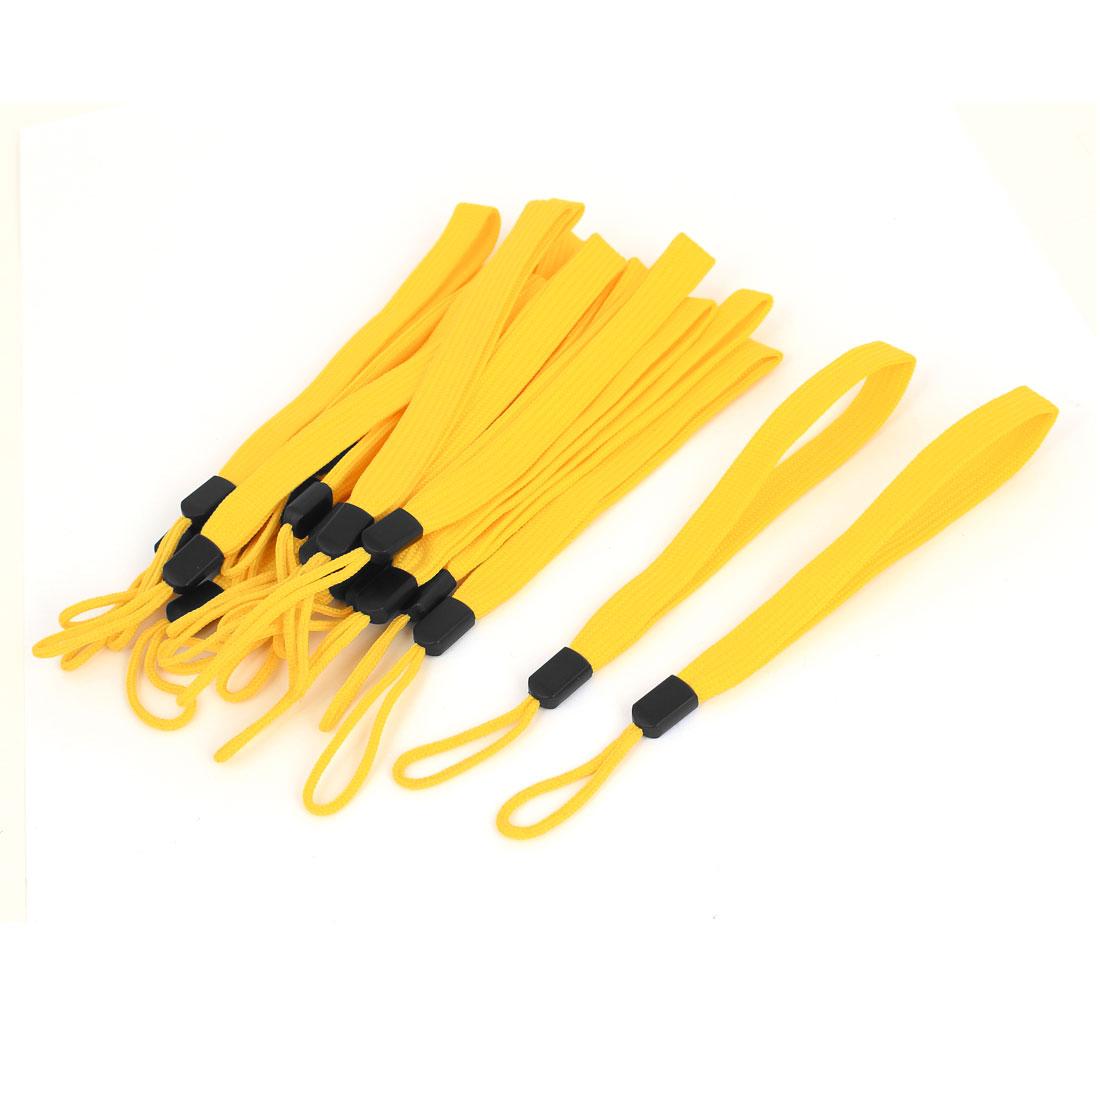 16cm Length Lanyard Strap Hang Rope 20Pcs Yellow for Smartphone Selfie Stick Monopod